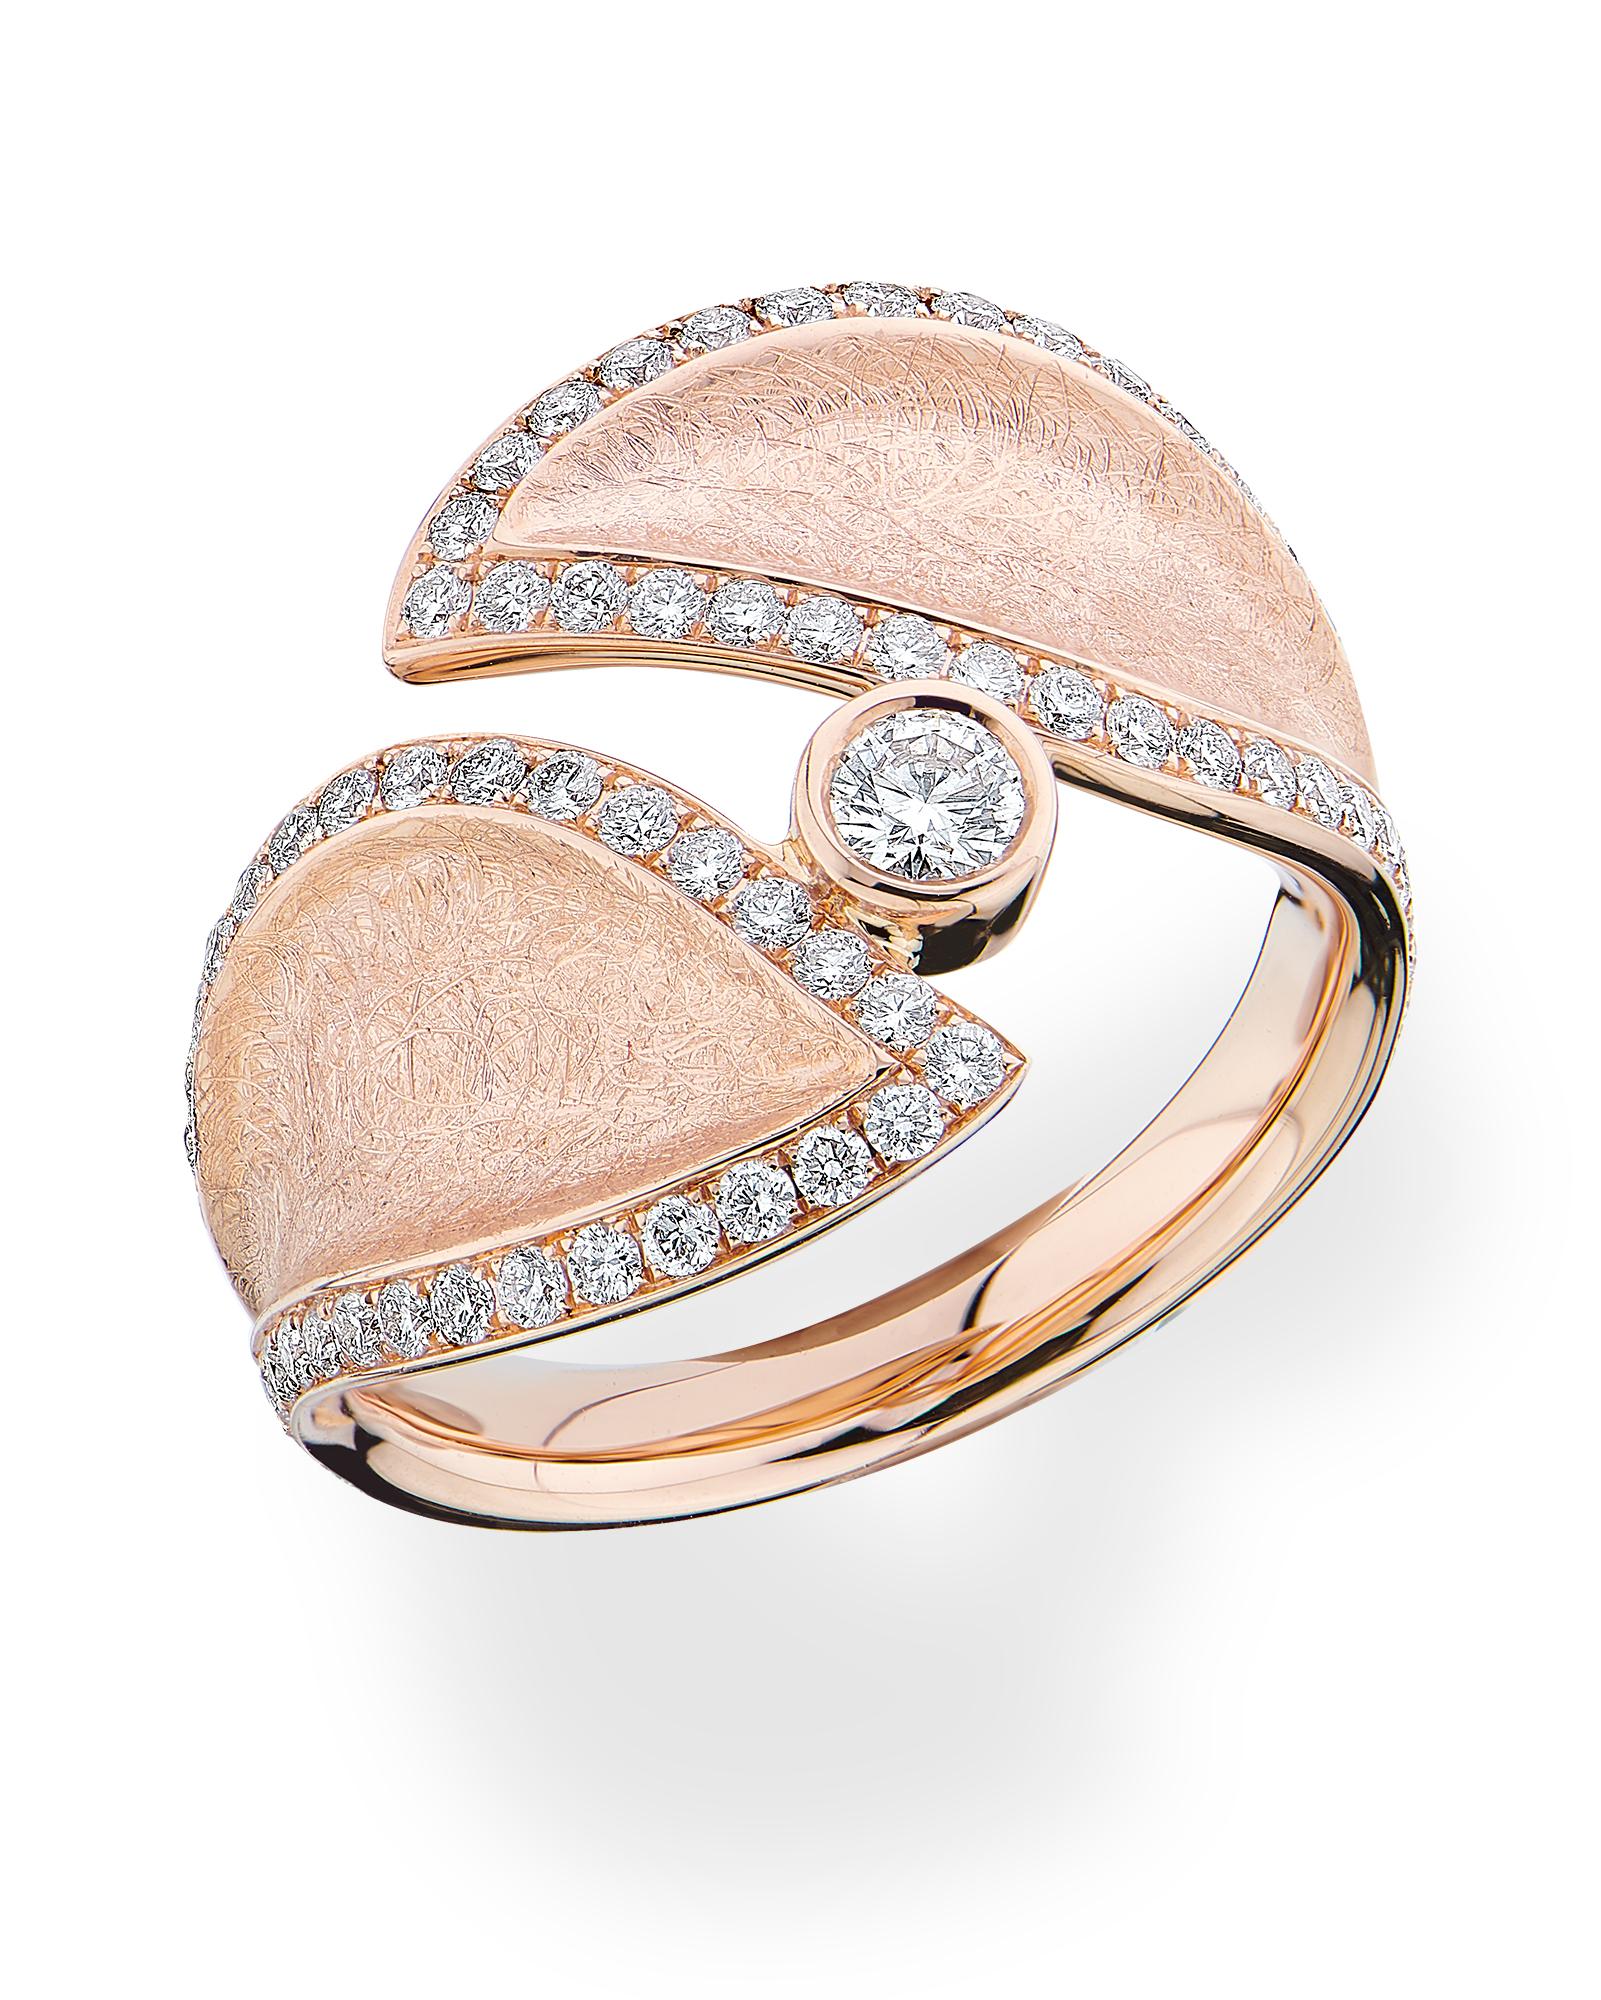 Frieden Thun - Swiss Jewellers